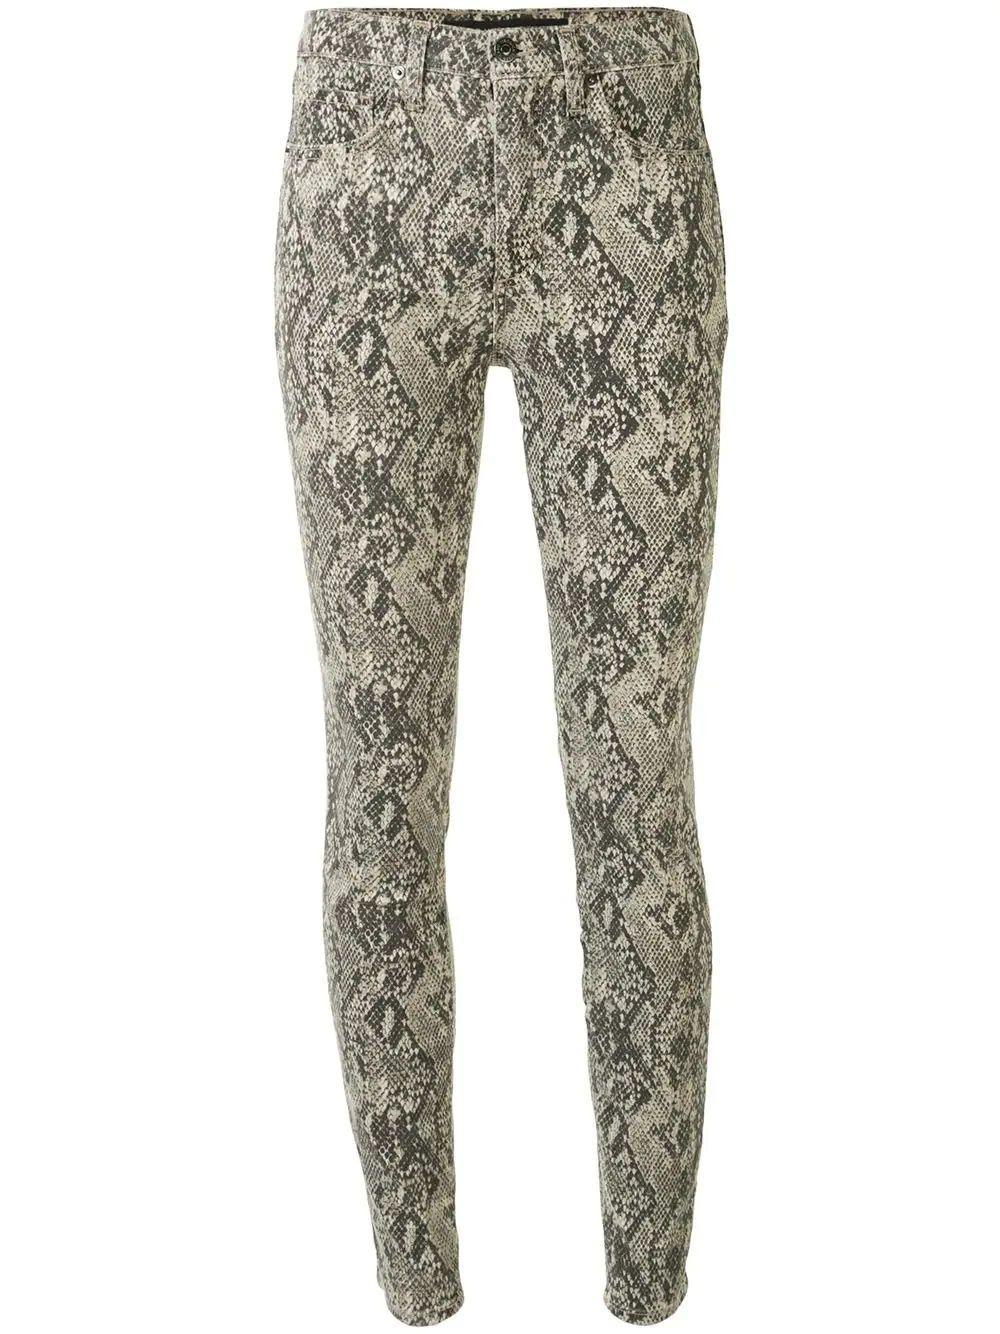 Kate Python Print High Rise Skinny Jean